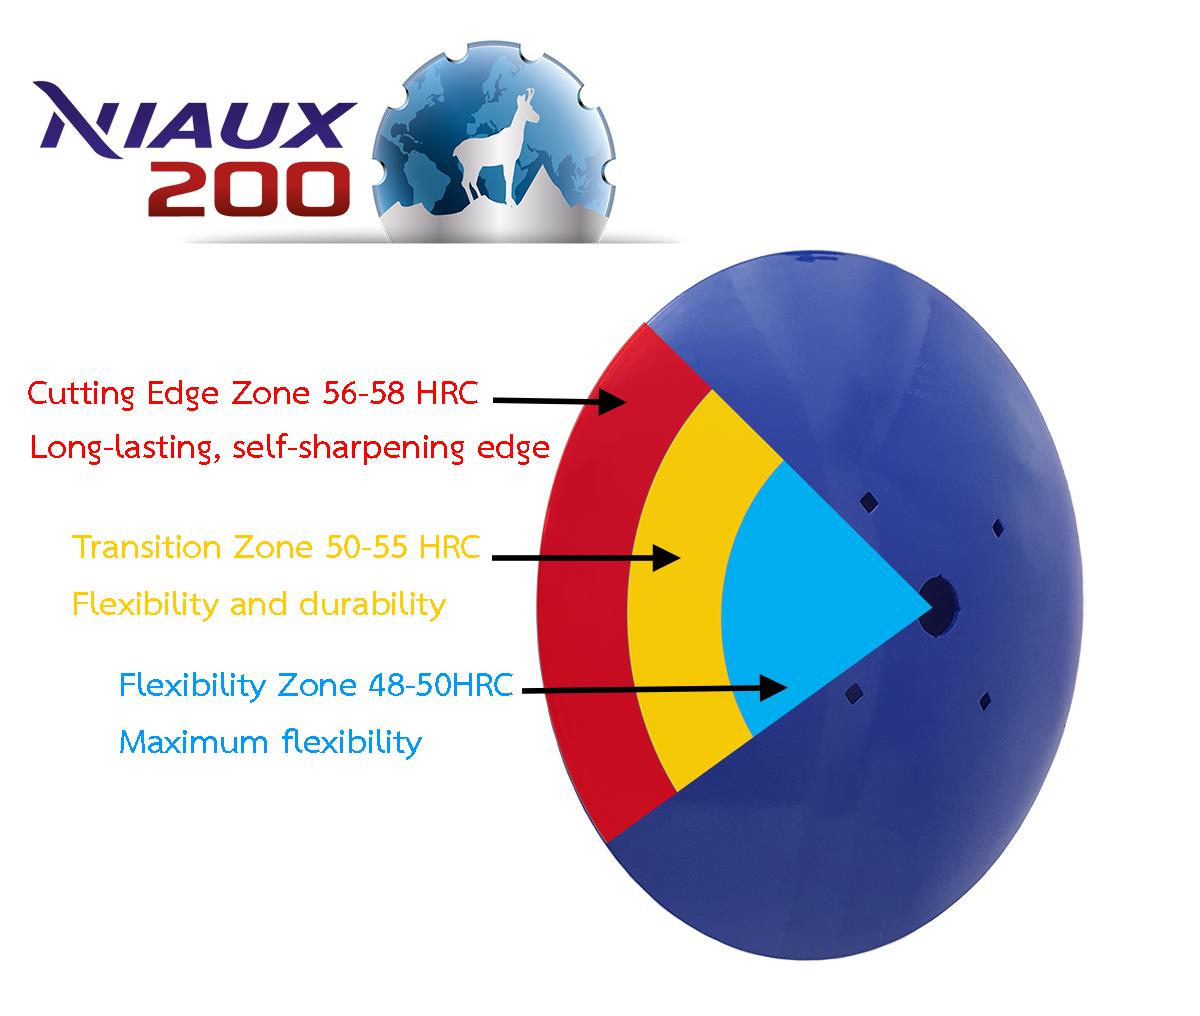 Niaux 200 disc characteristics